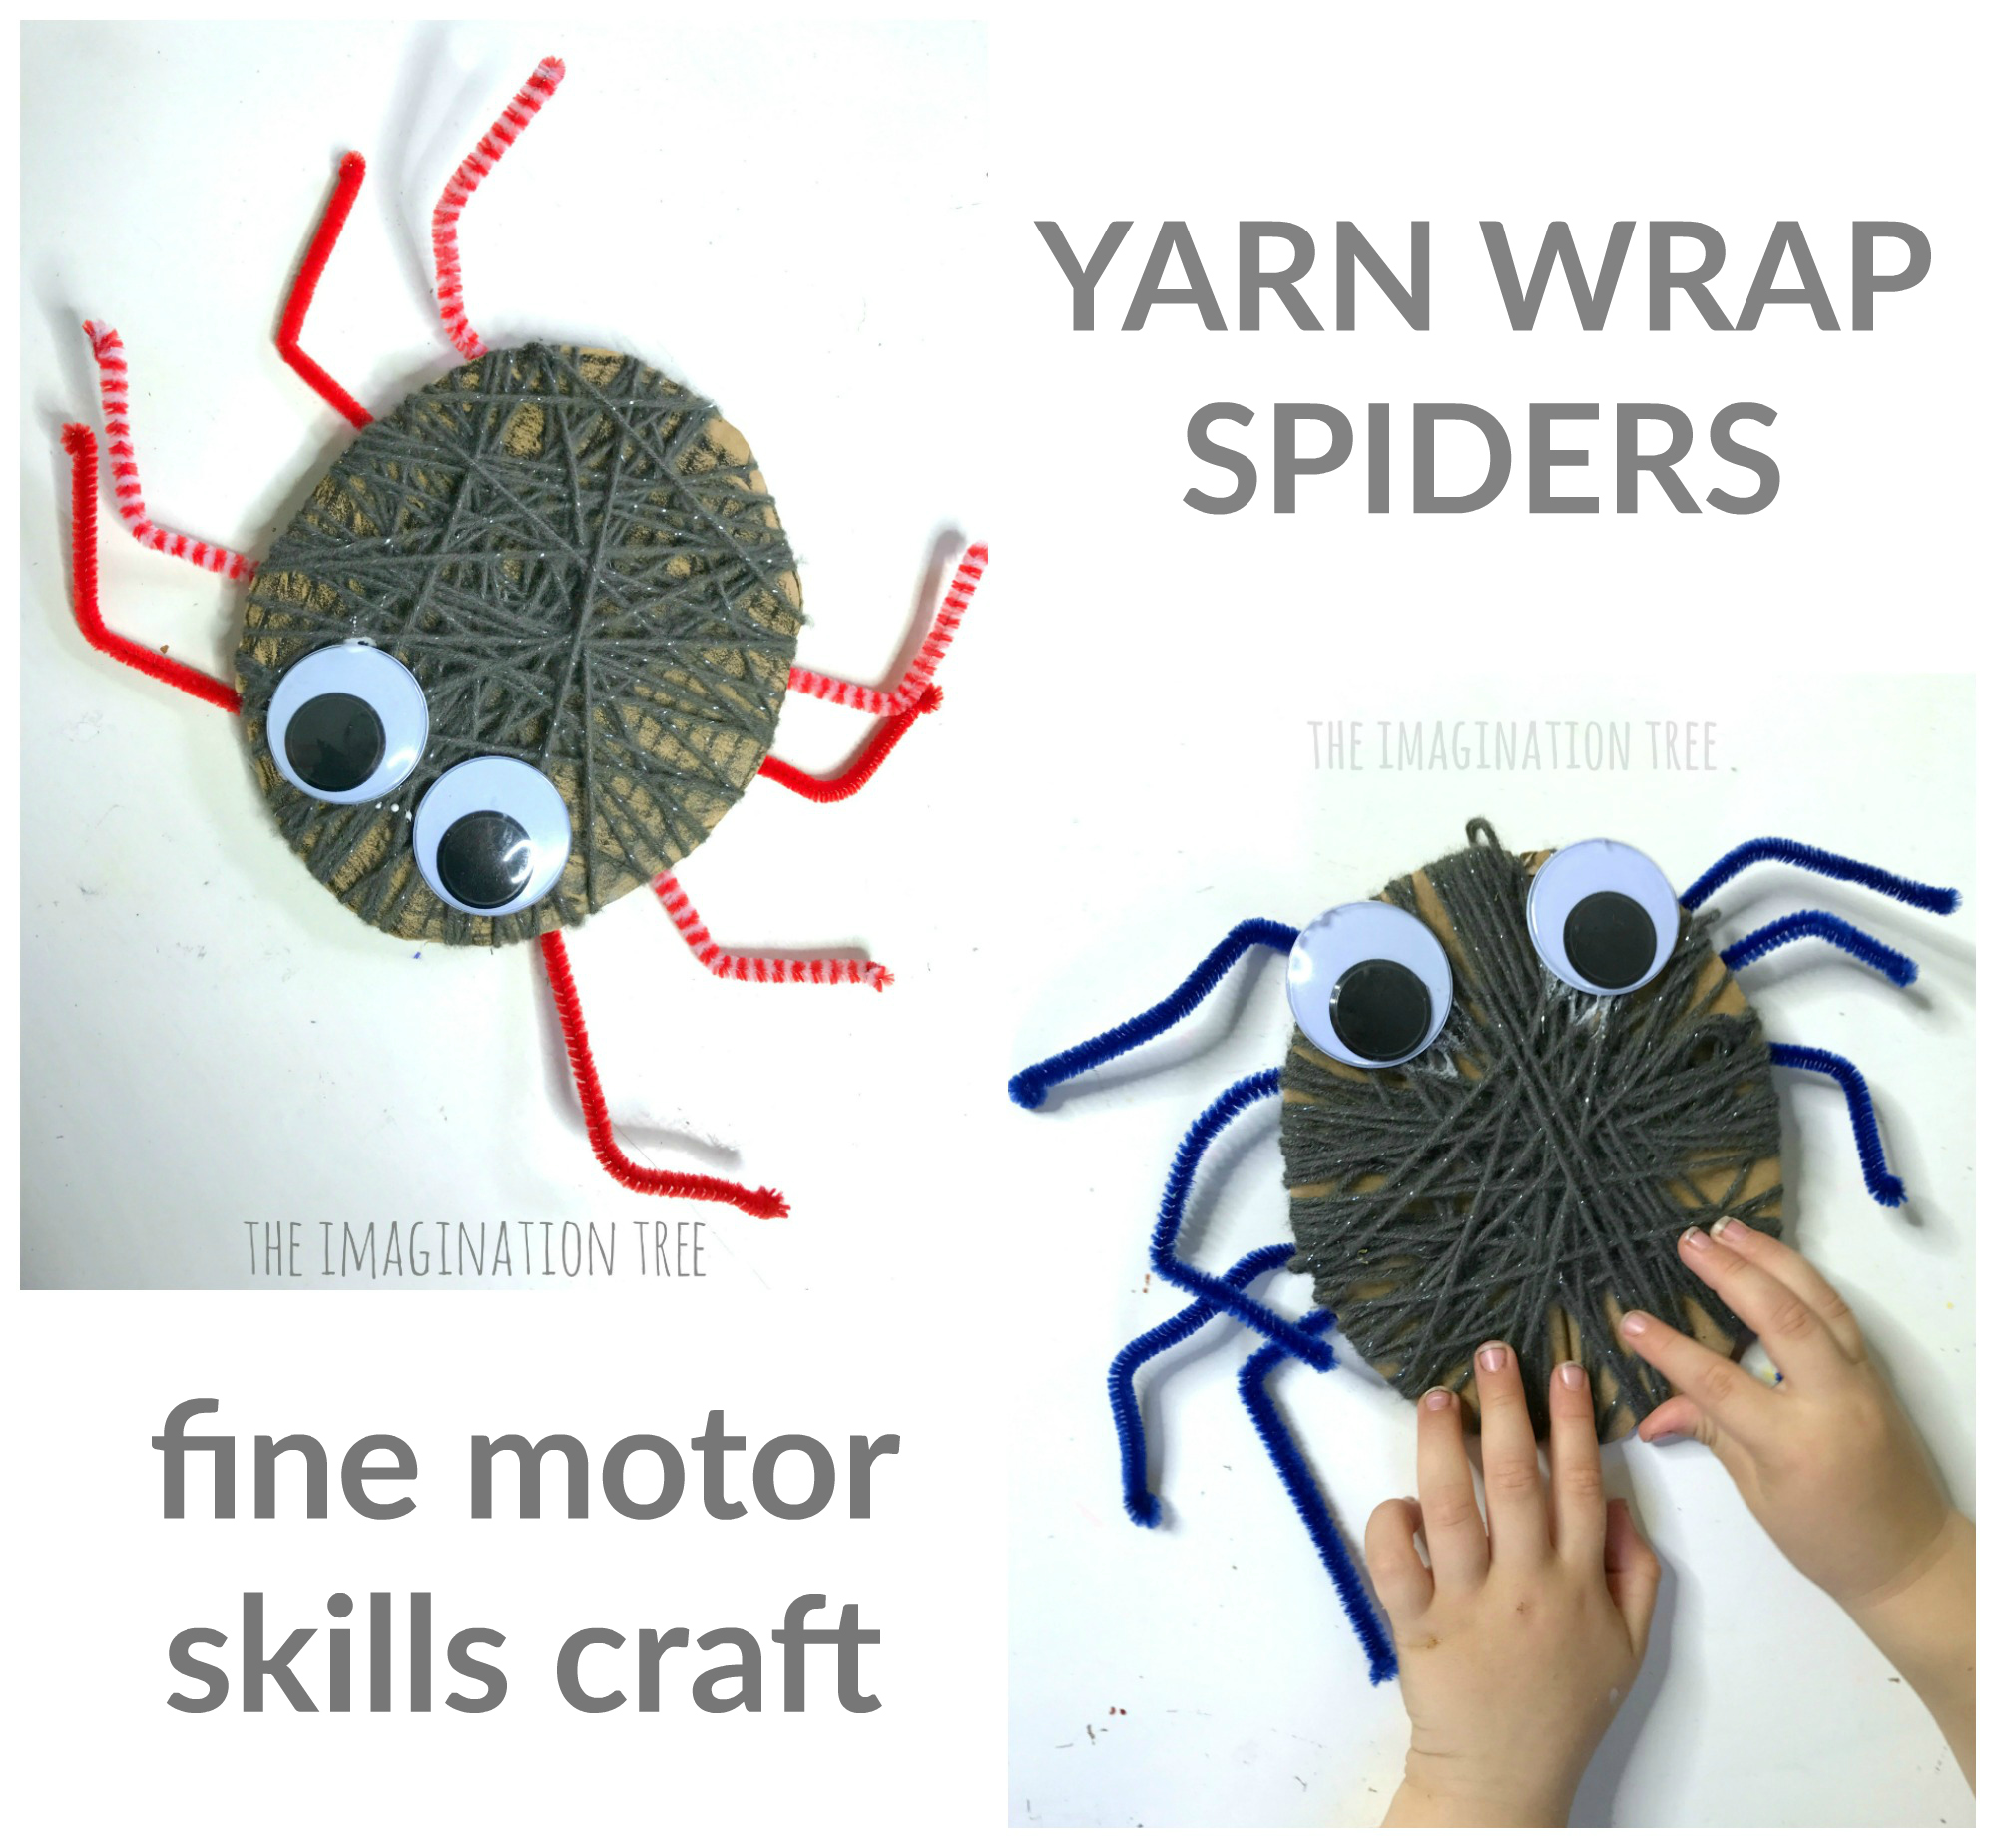 Yarn Wrap Spider Craft The Imagination Tree